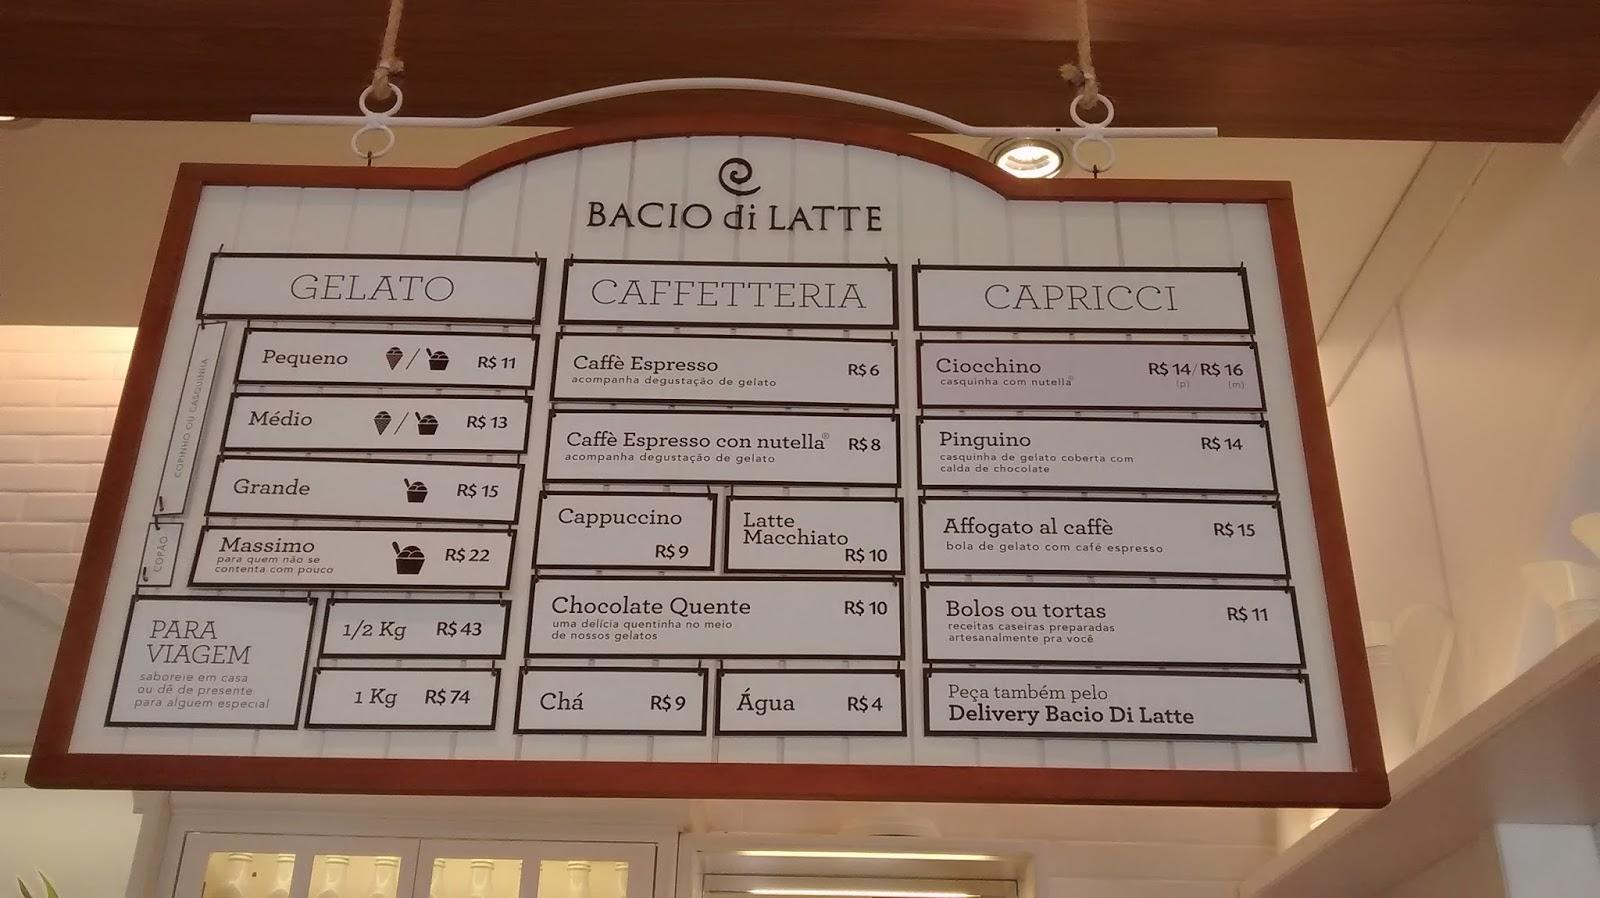 cardápio Bacio di Latte,cardápio Bacio di Latte,cardápio Bacio di Latte,cardápio Bacio di Latte